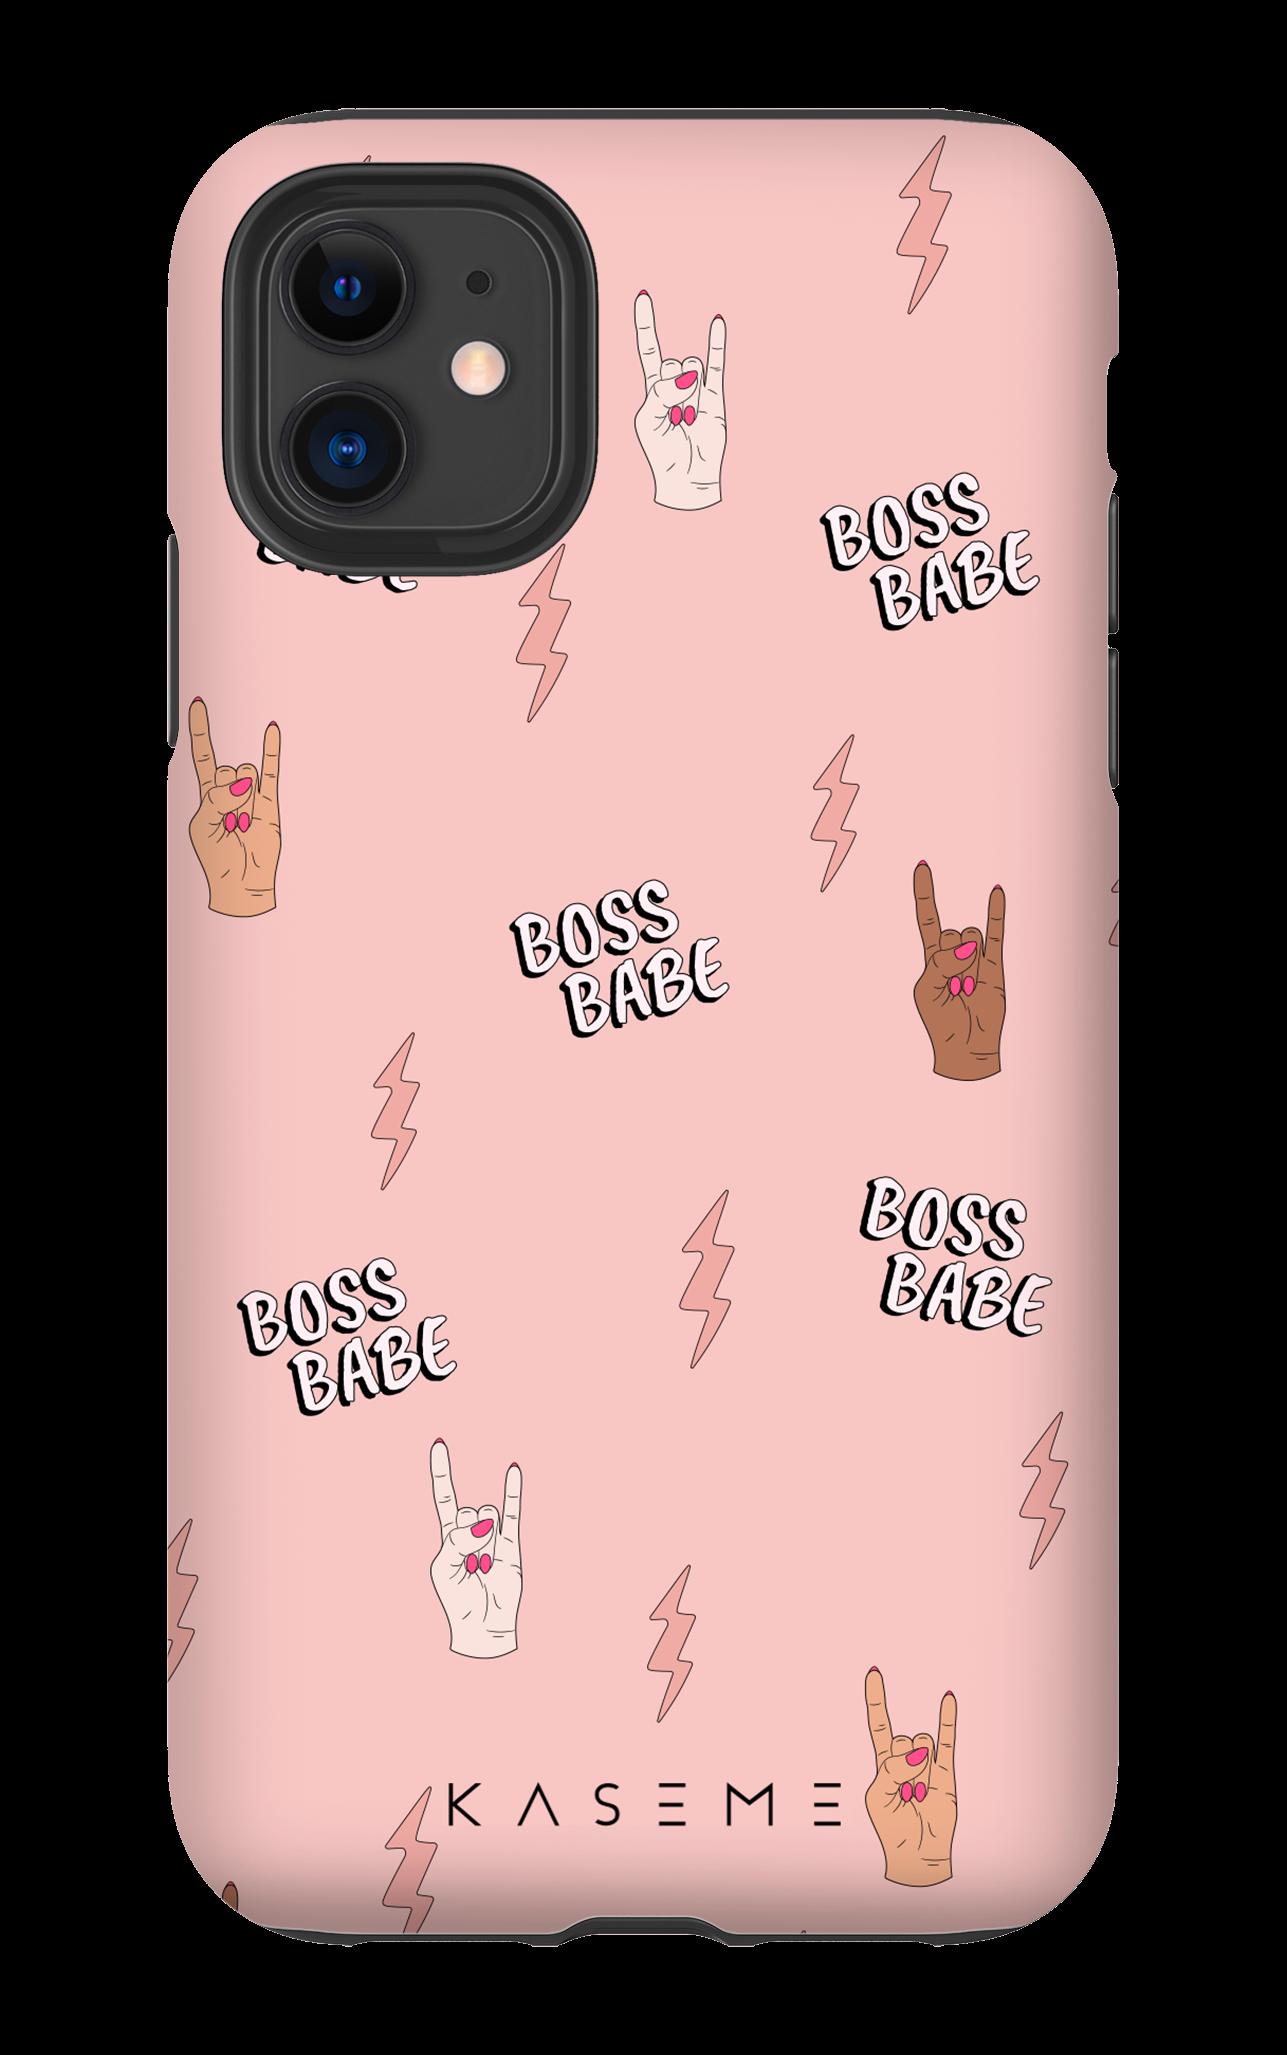 Boss babe phone case